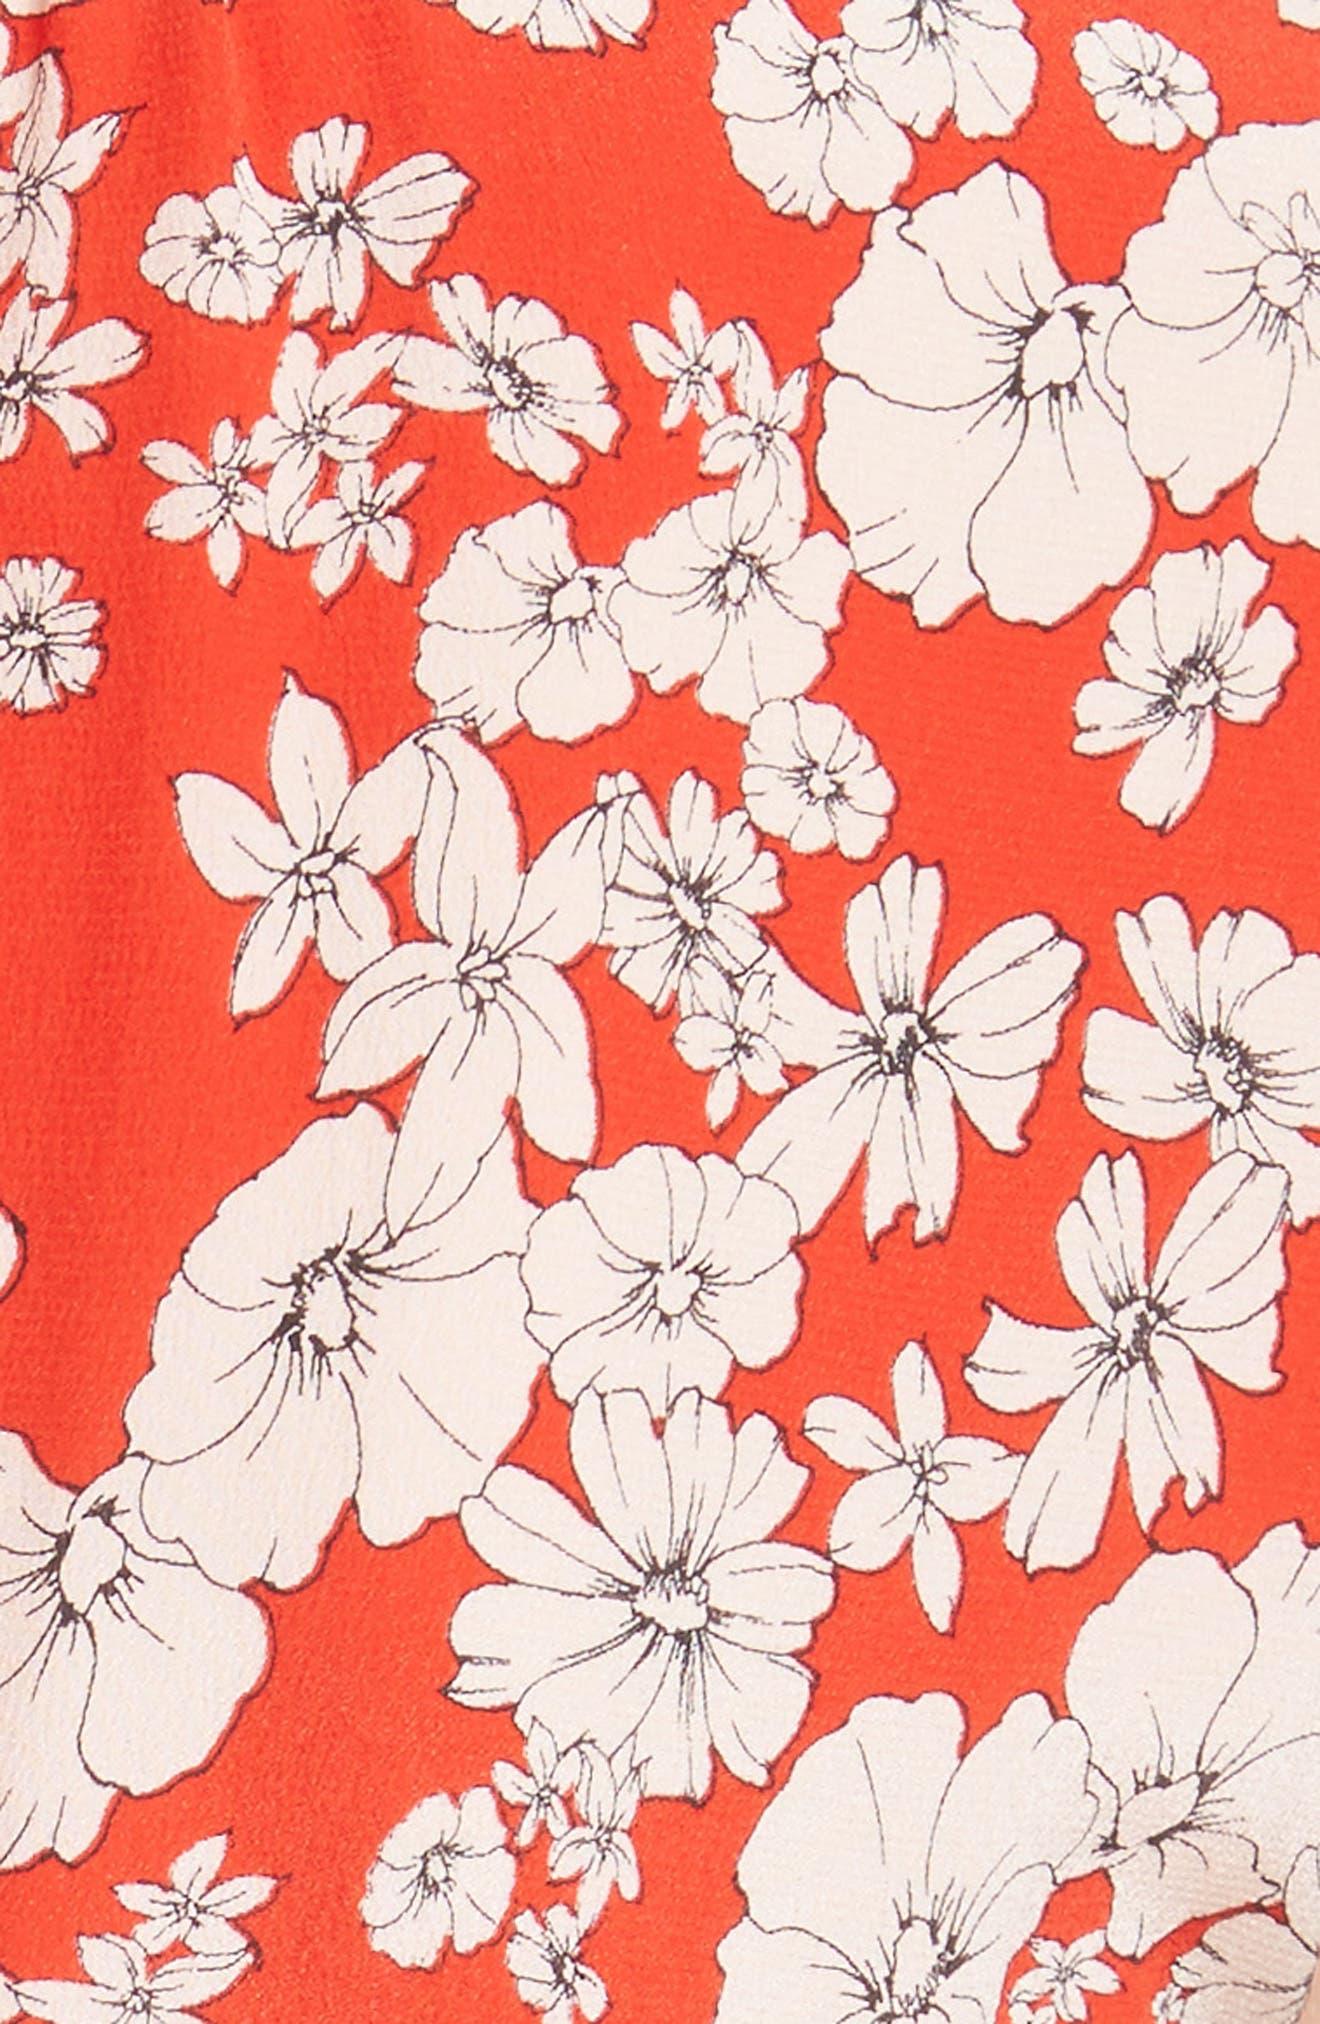 Cherry Blossom Silk Wrap Dress,                             Alternate thumbnail 5, color,                             Candy Apple Combo